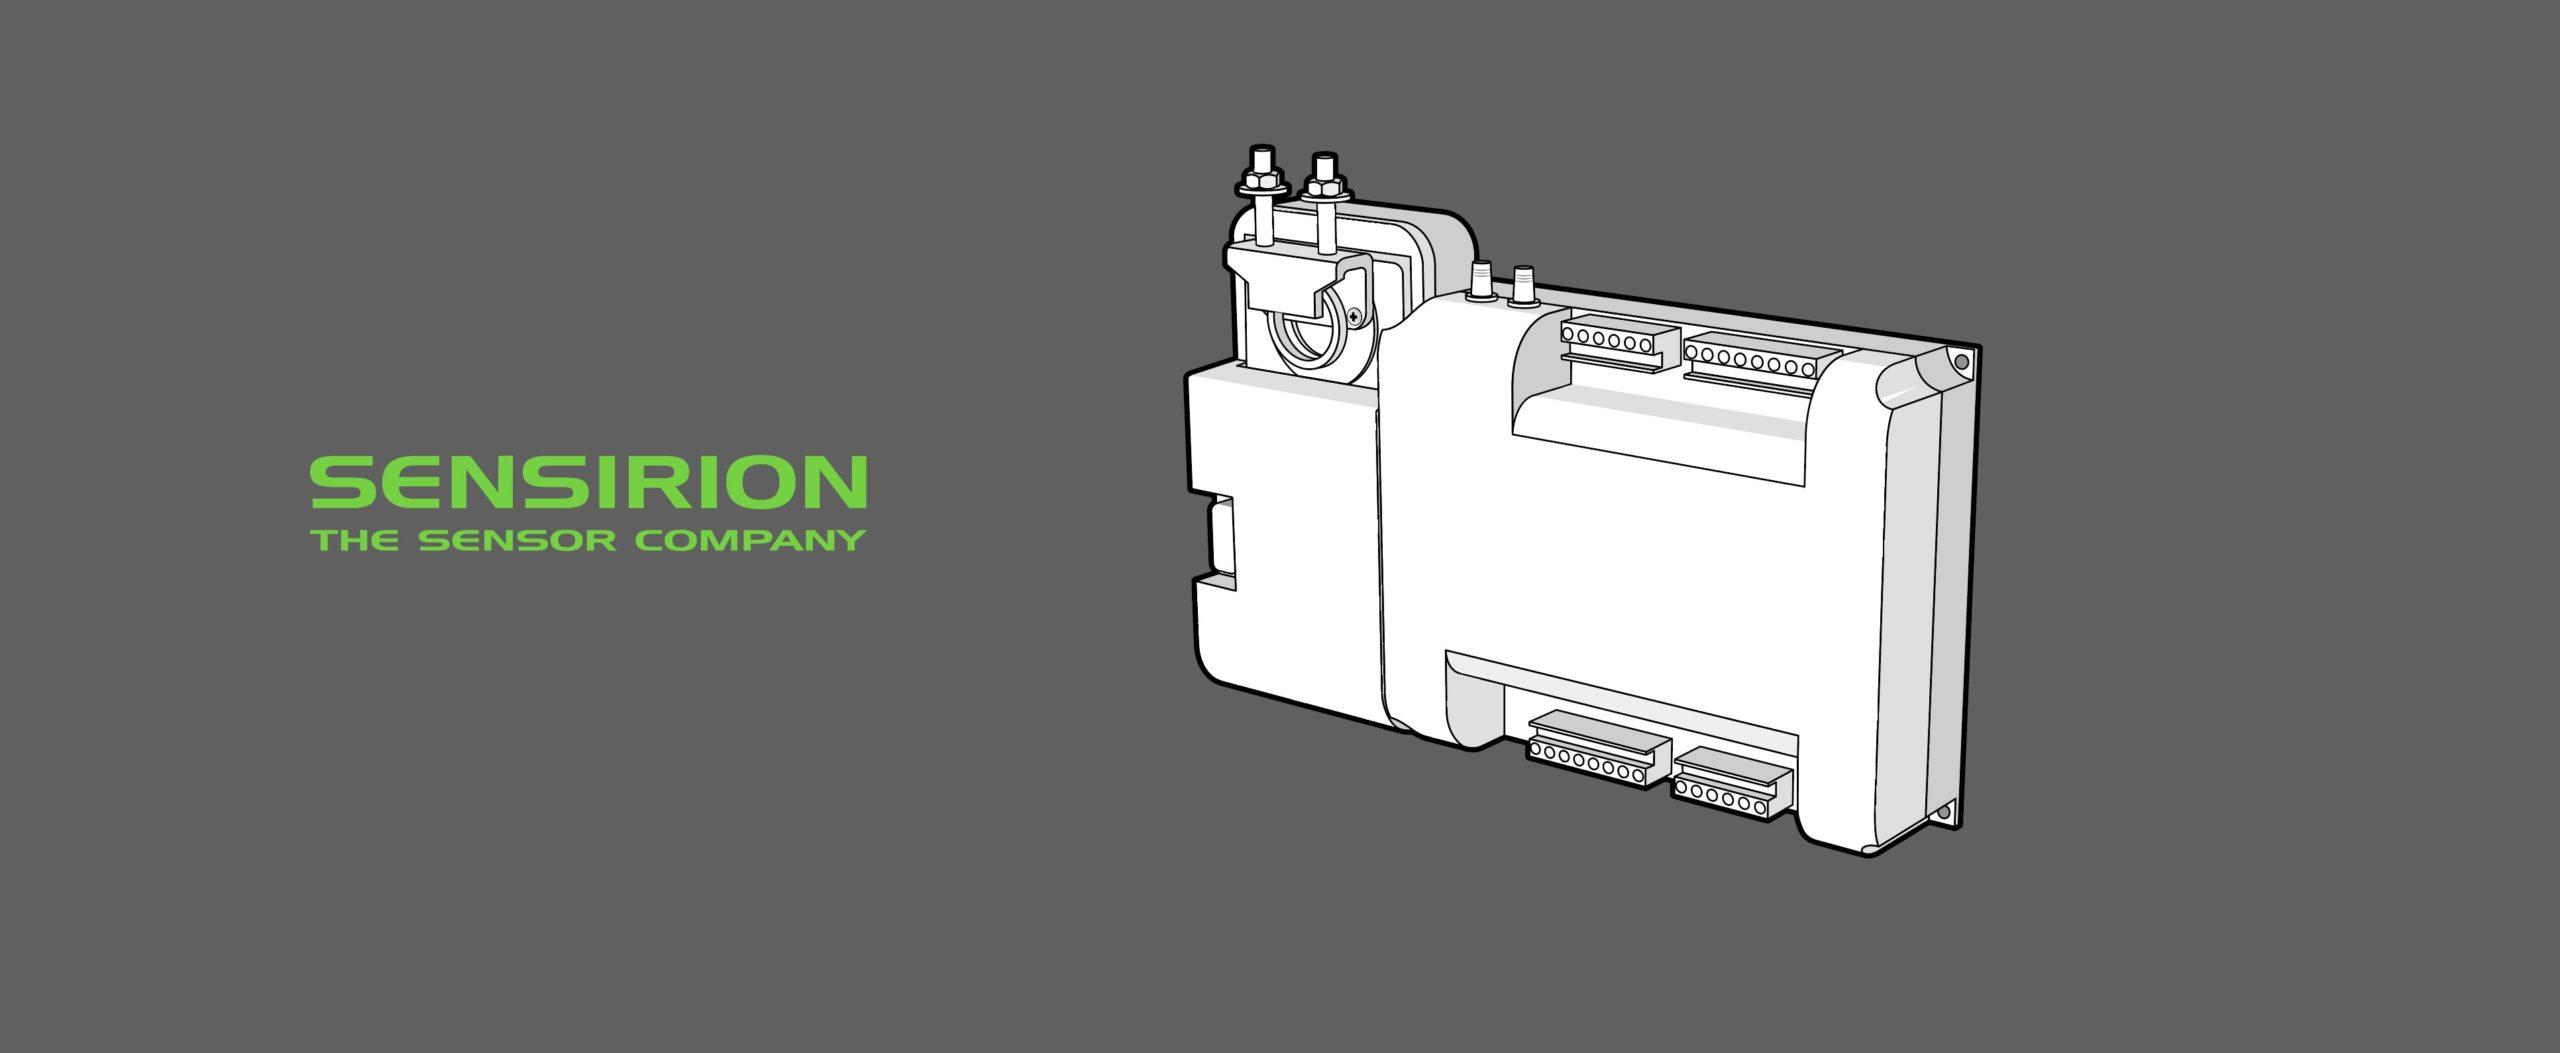 Sensirion_Sensor_Geraet